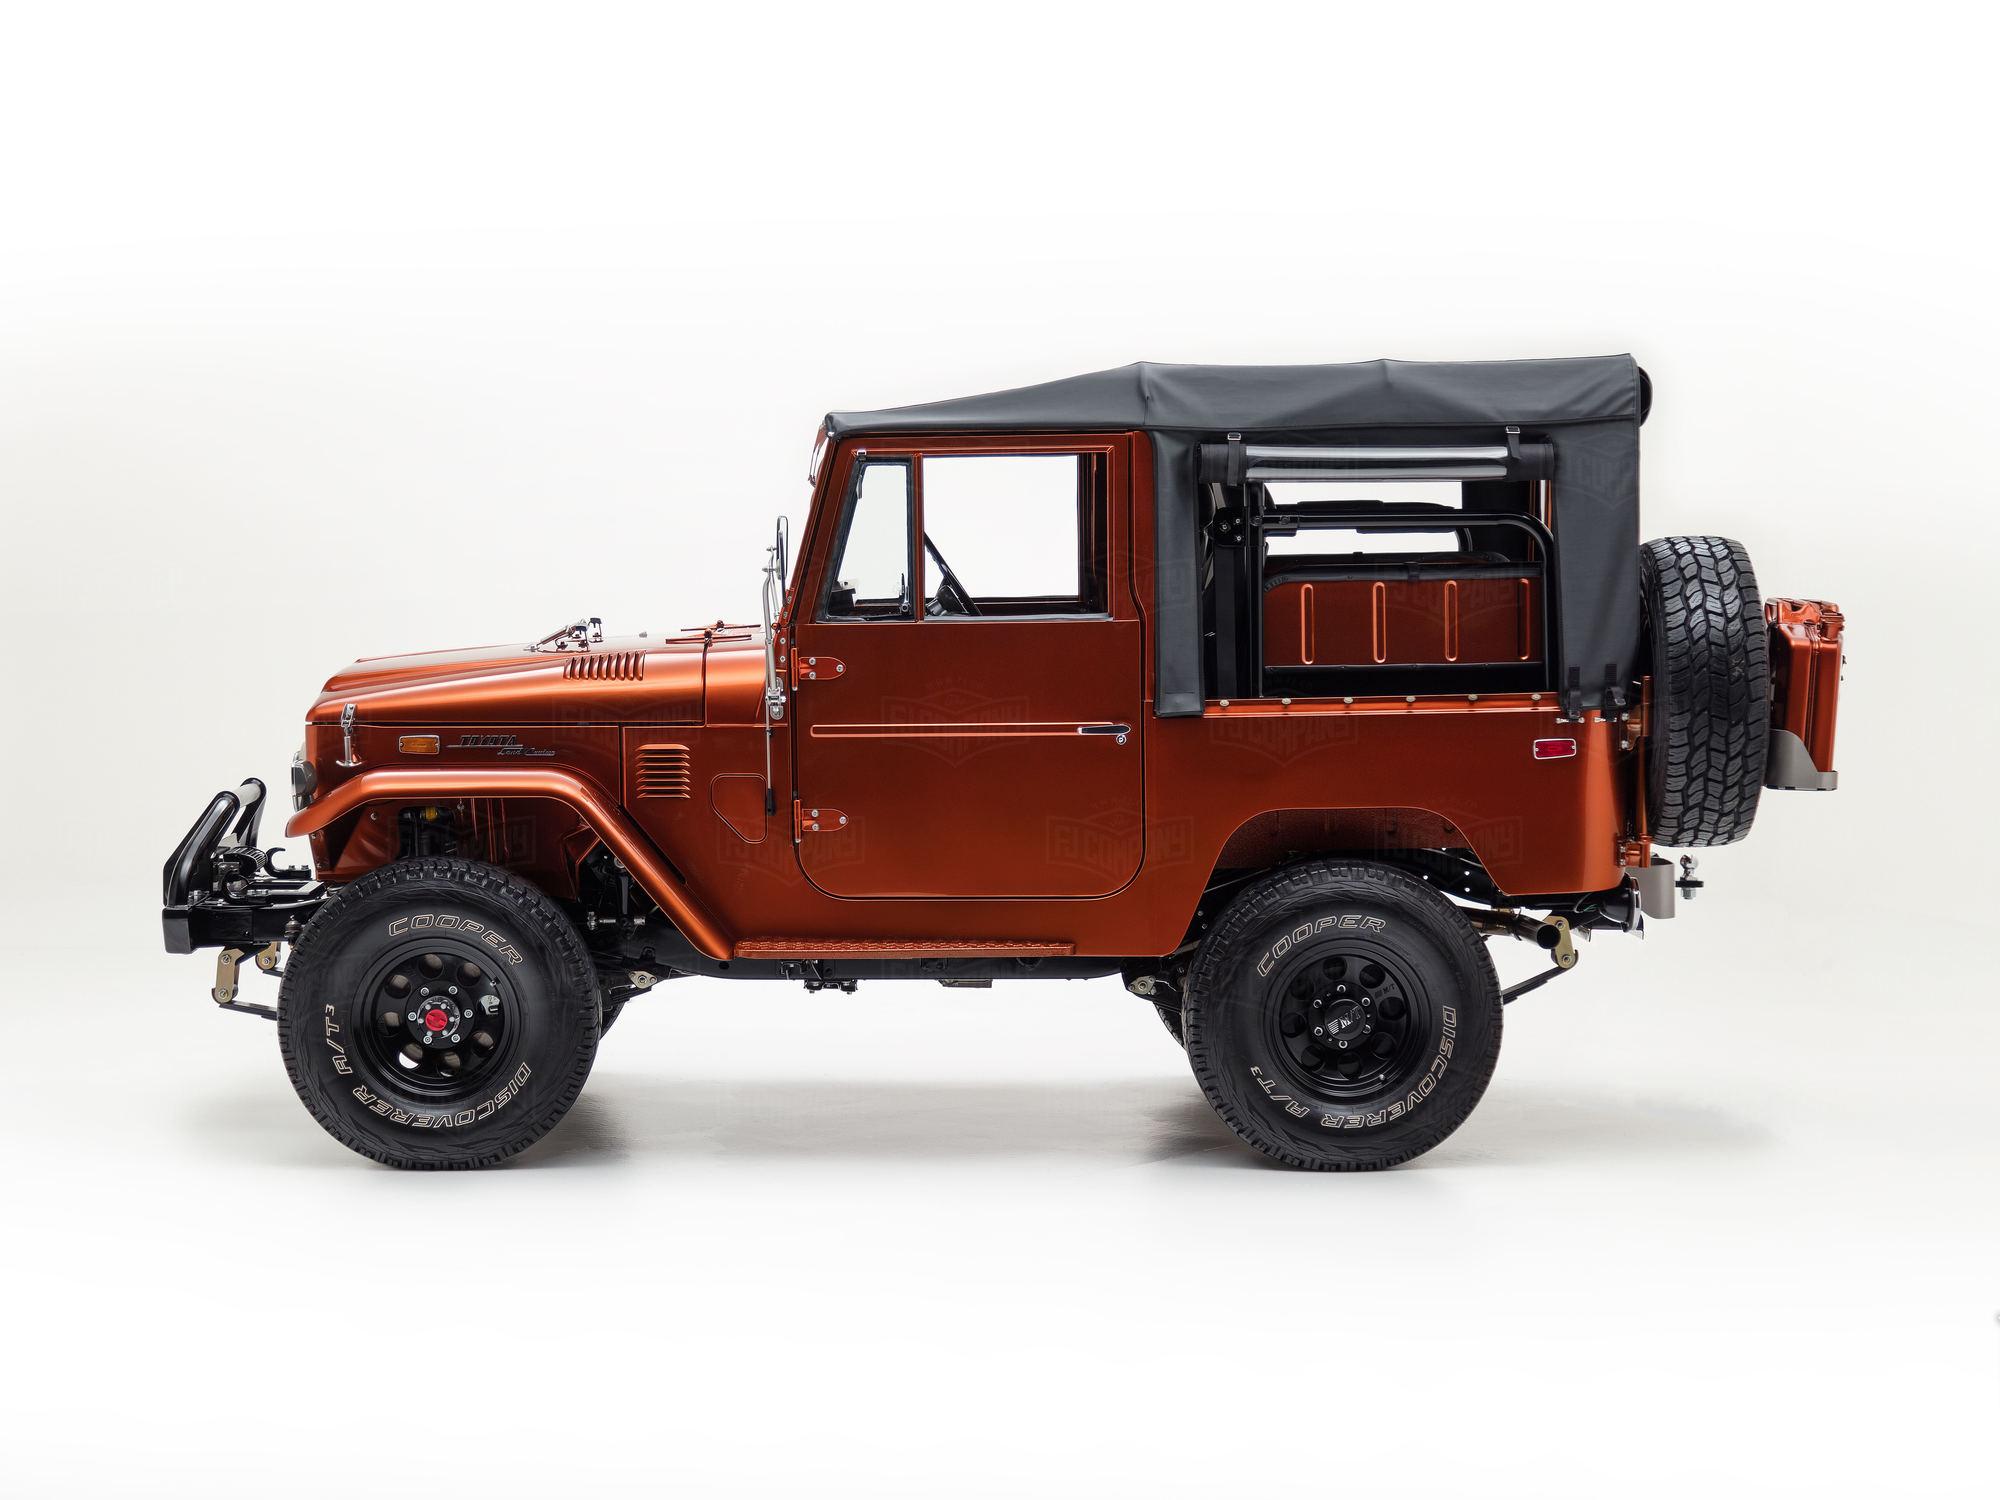 1972 Fj40 Metallic Orange 126414 1975 Toyota Land Cruiser